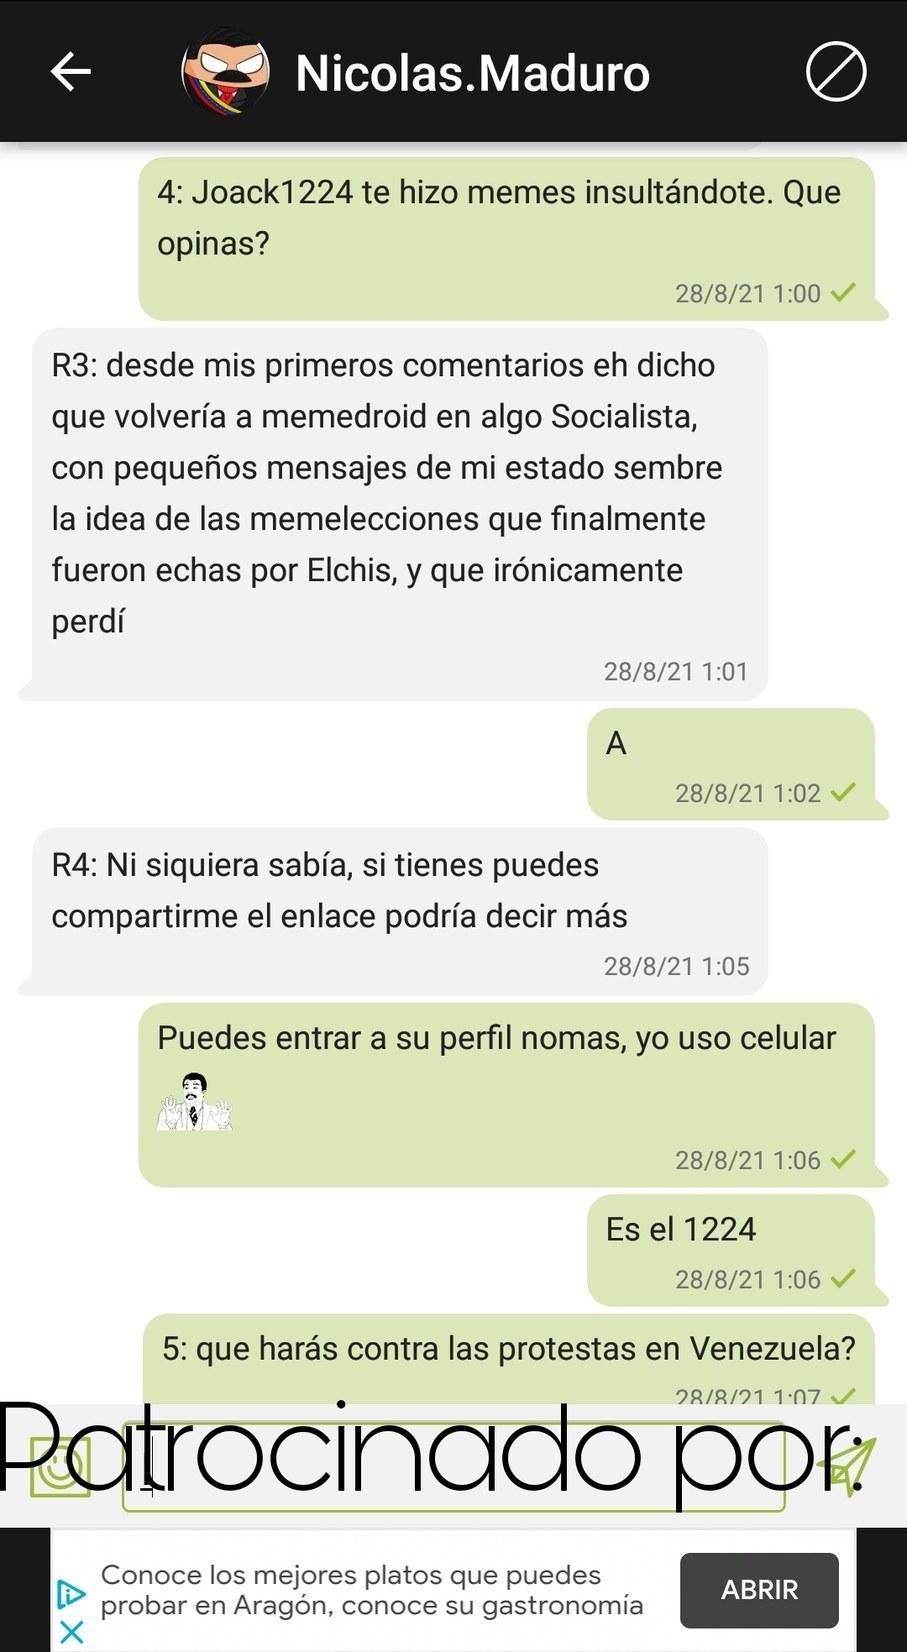 Memeentrevistas, cap 1, pt 2: Nicolás Maduro